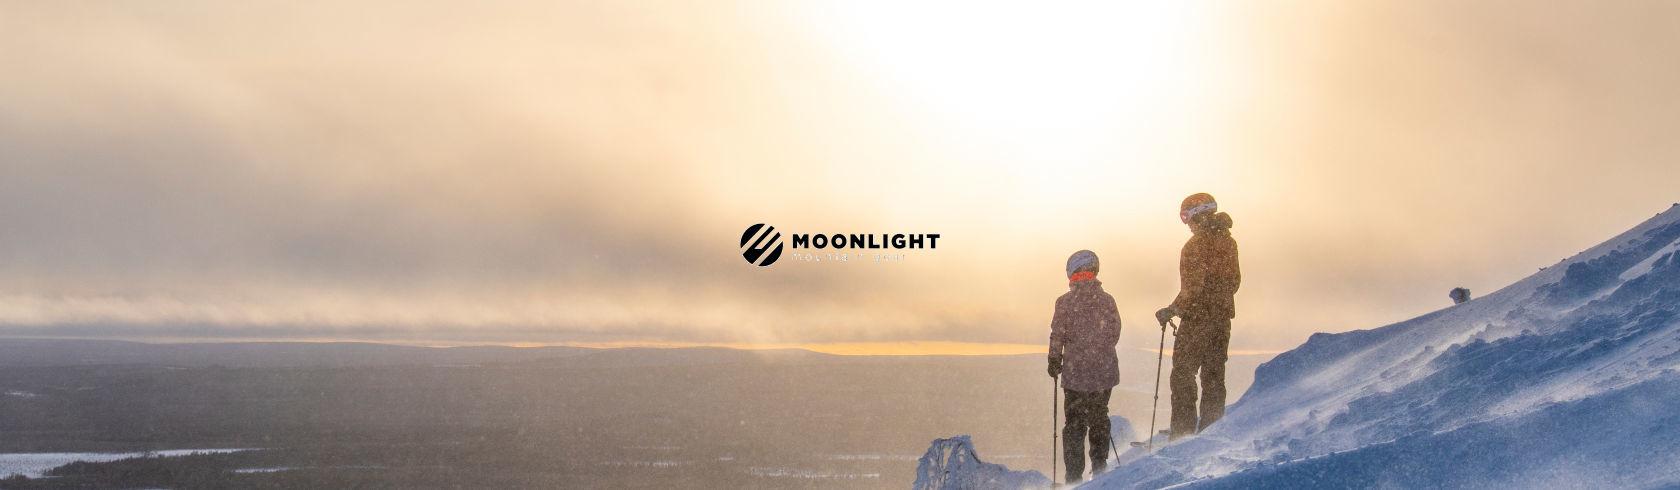 Moonlight Mountain Gear brand logo